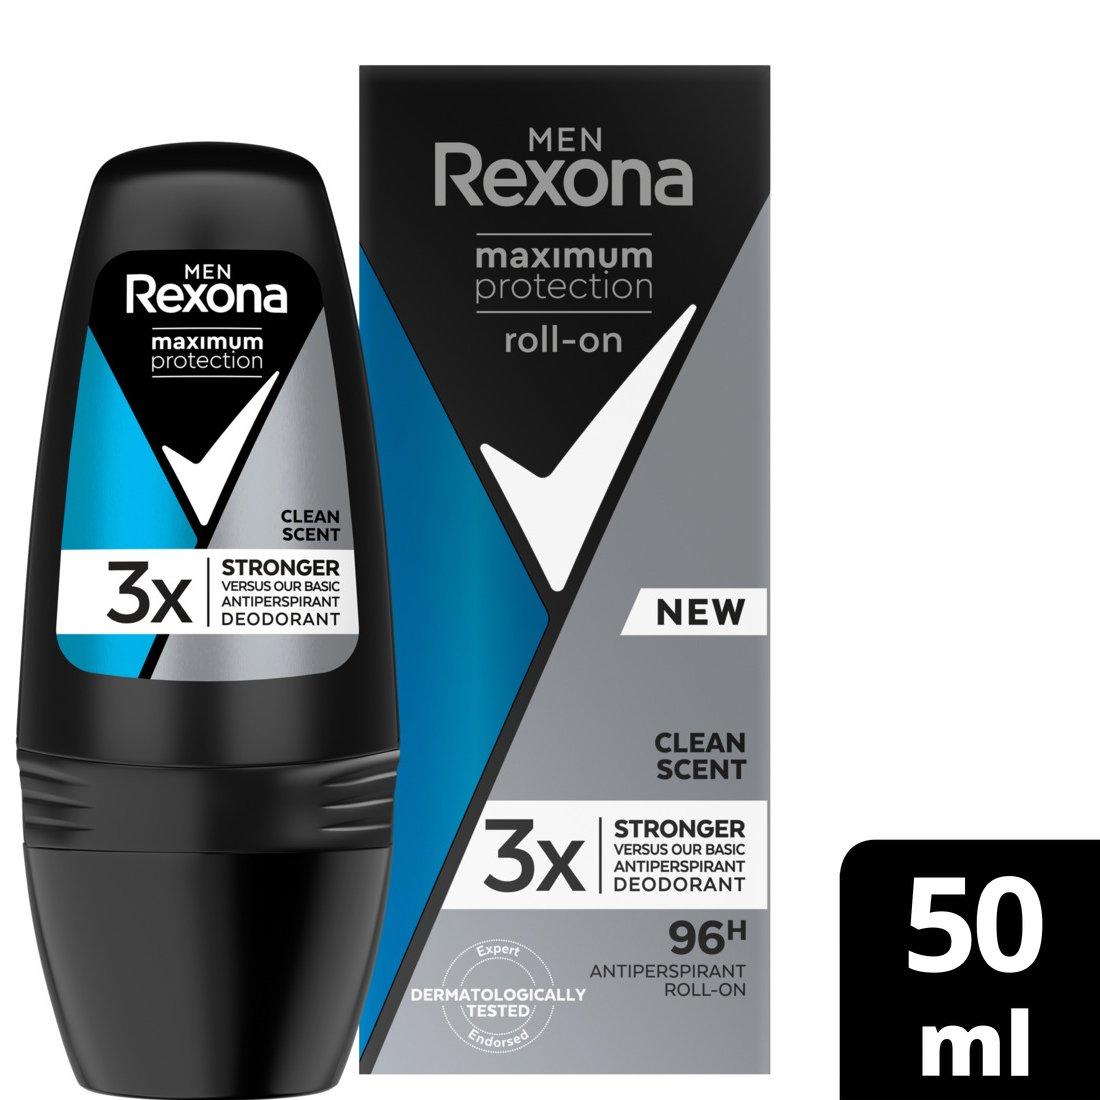 Rexona Men Maximum Protection Roll – On Clean Scent 96h Αντιιδρωτικό με Αποτέλεσματικότητα Έως και 96 Ώρες 50ml